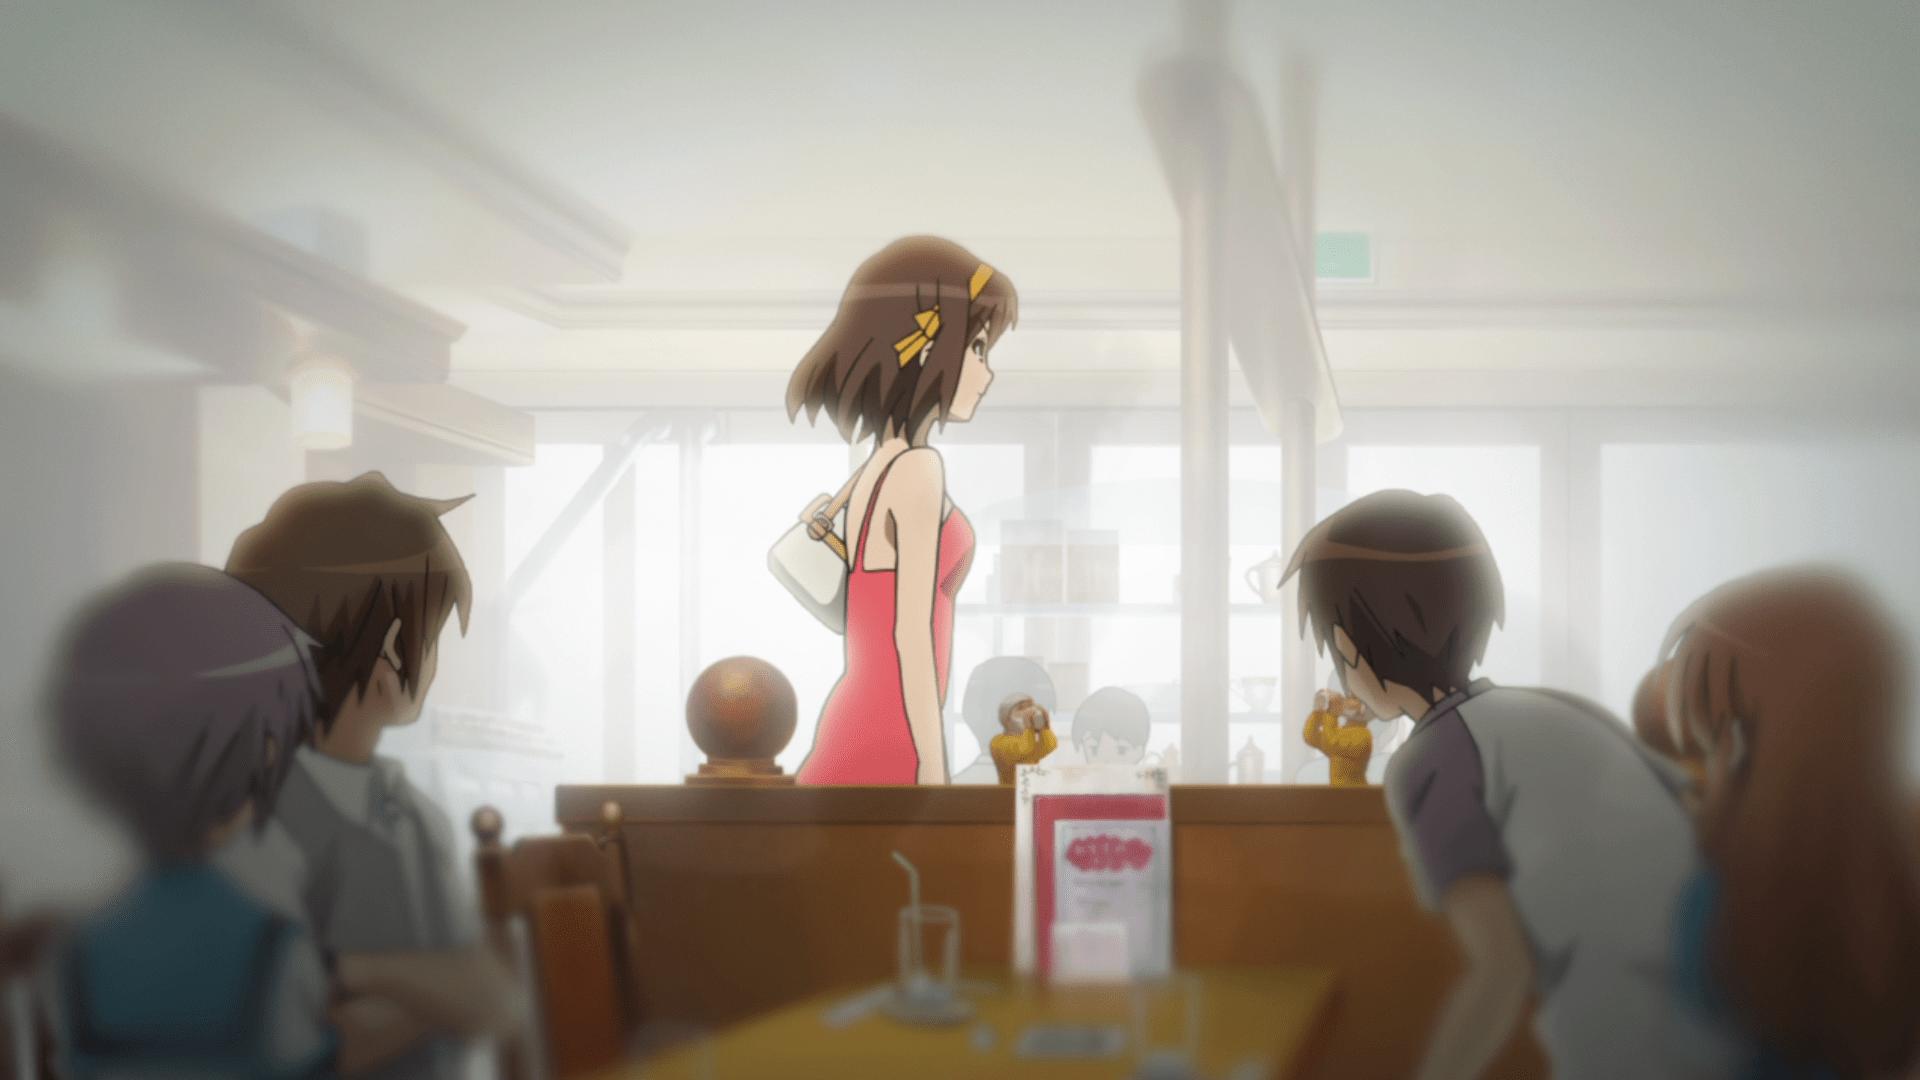 Haruhi - Endless Eight